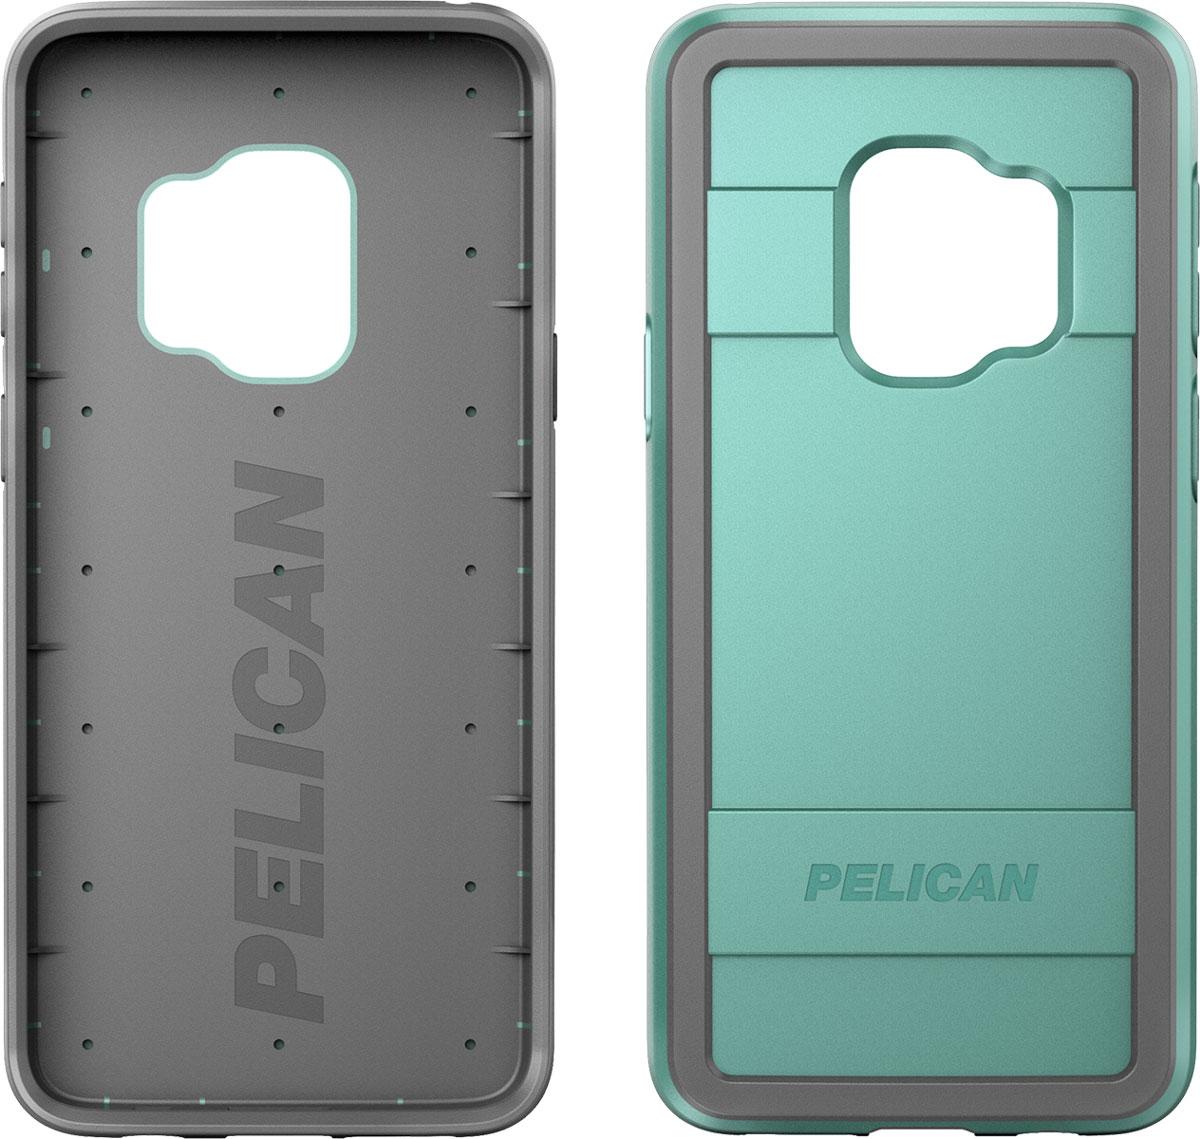 pelican c38000 samsung s9 protector phone case